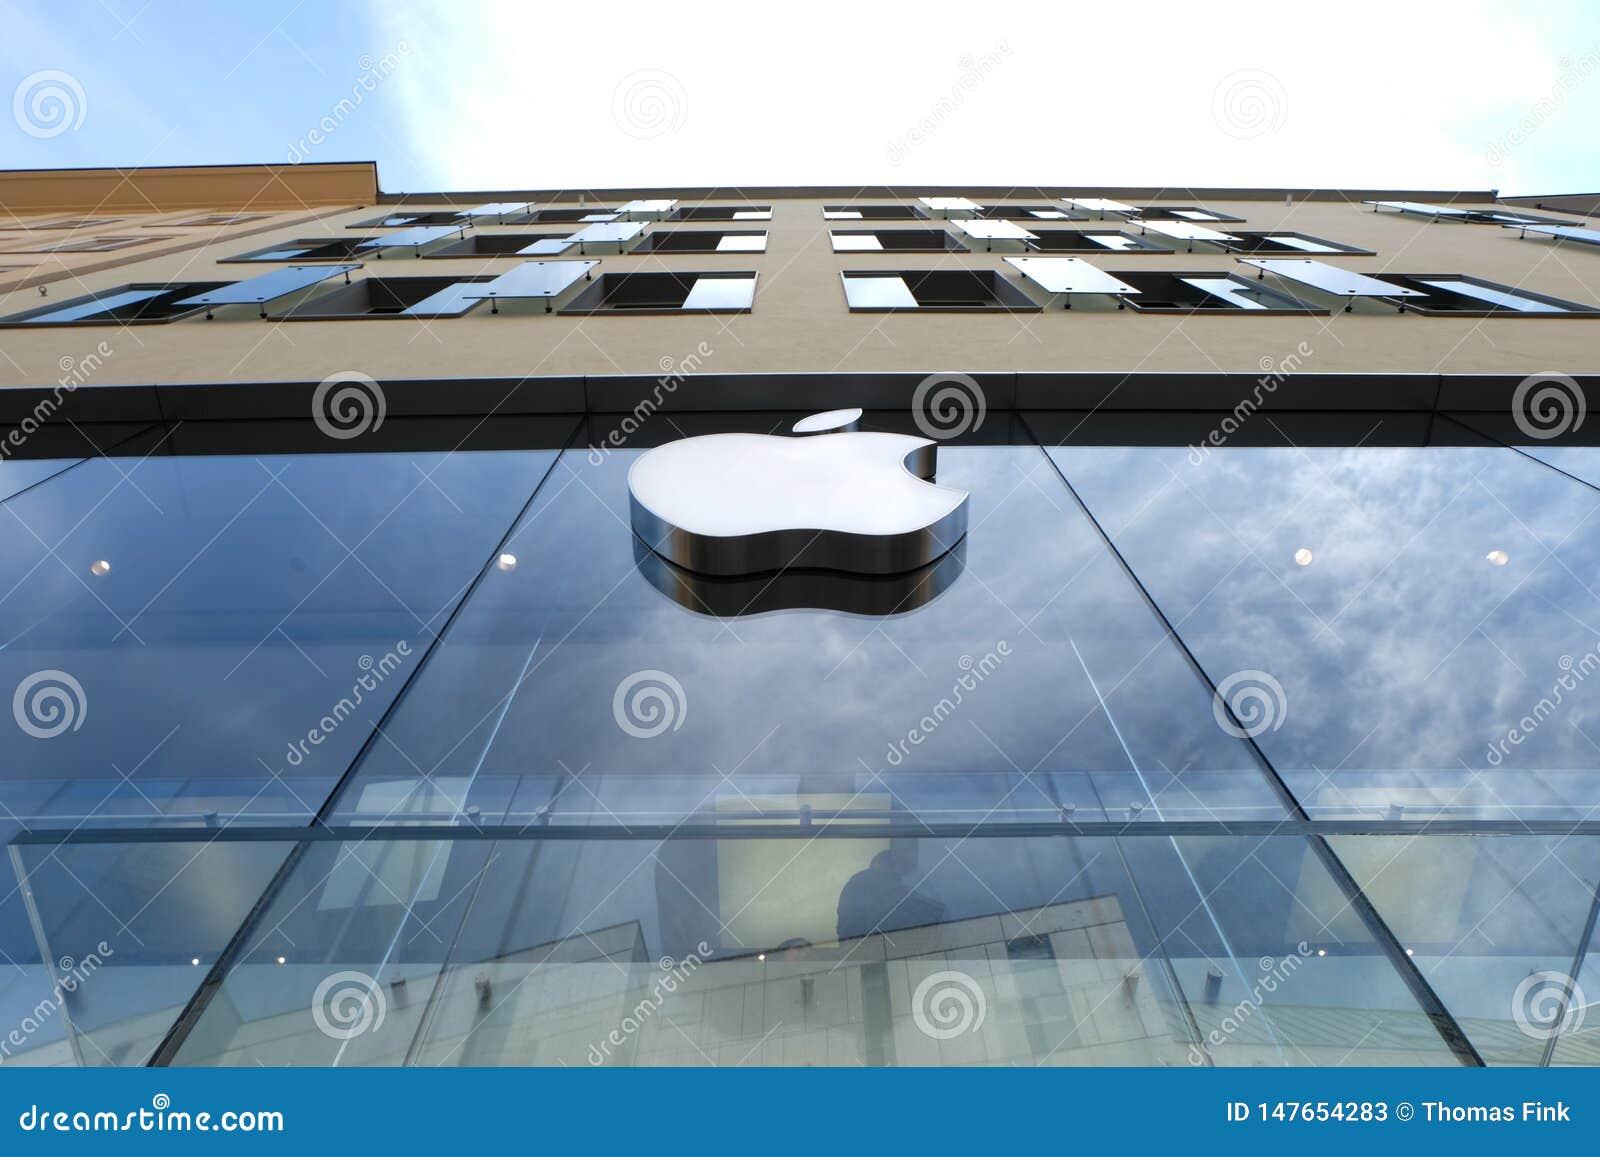 Apple Store i Munich med himmel